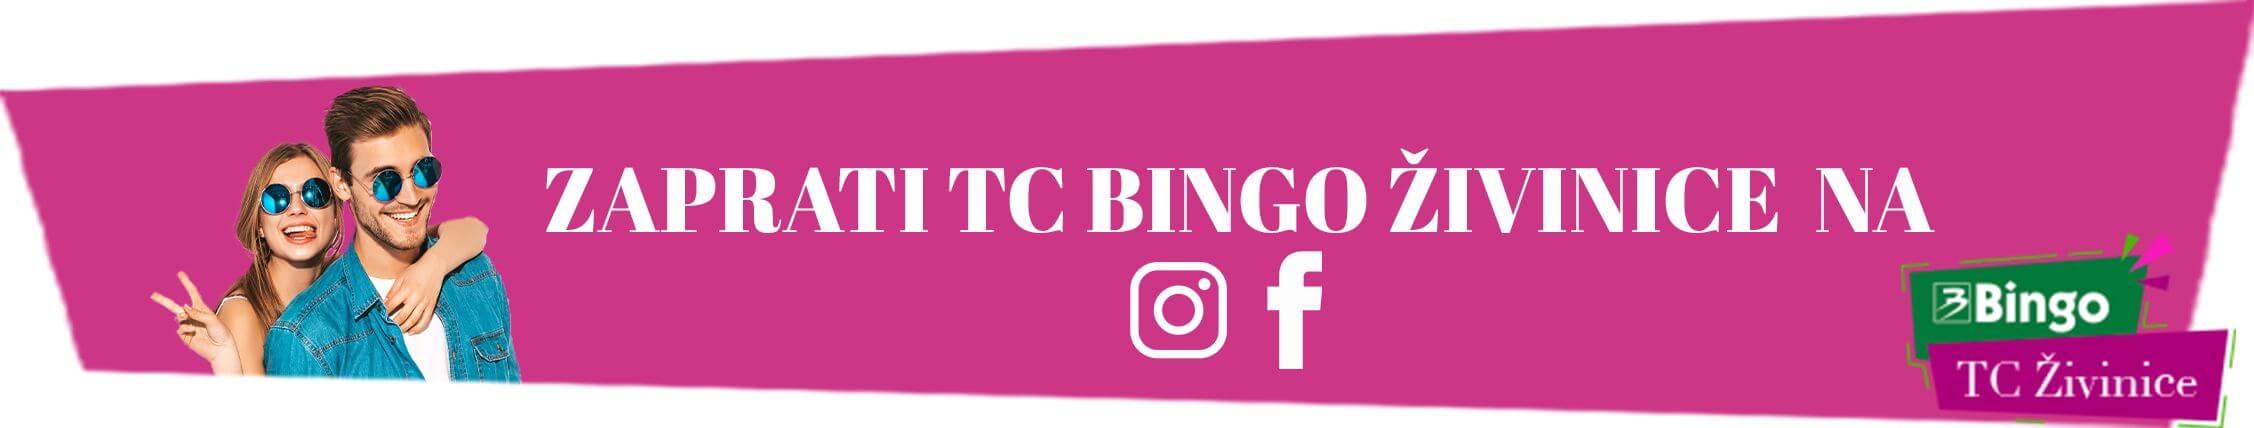 Bingo banner 1080×200